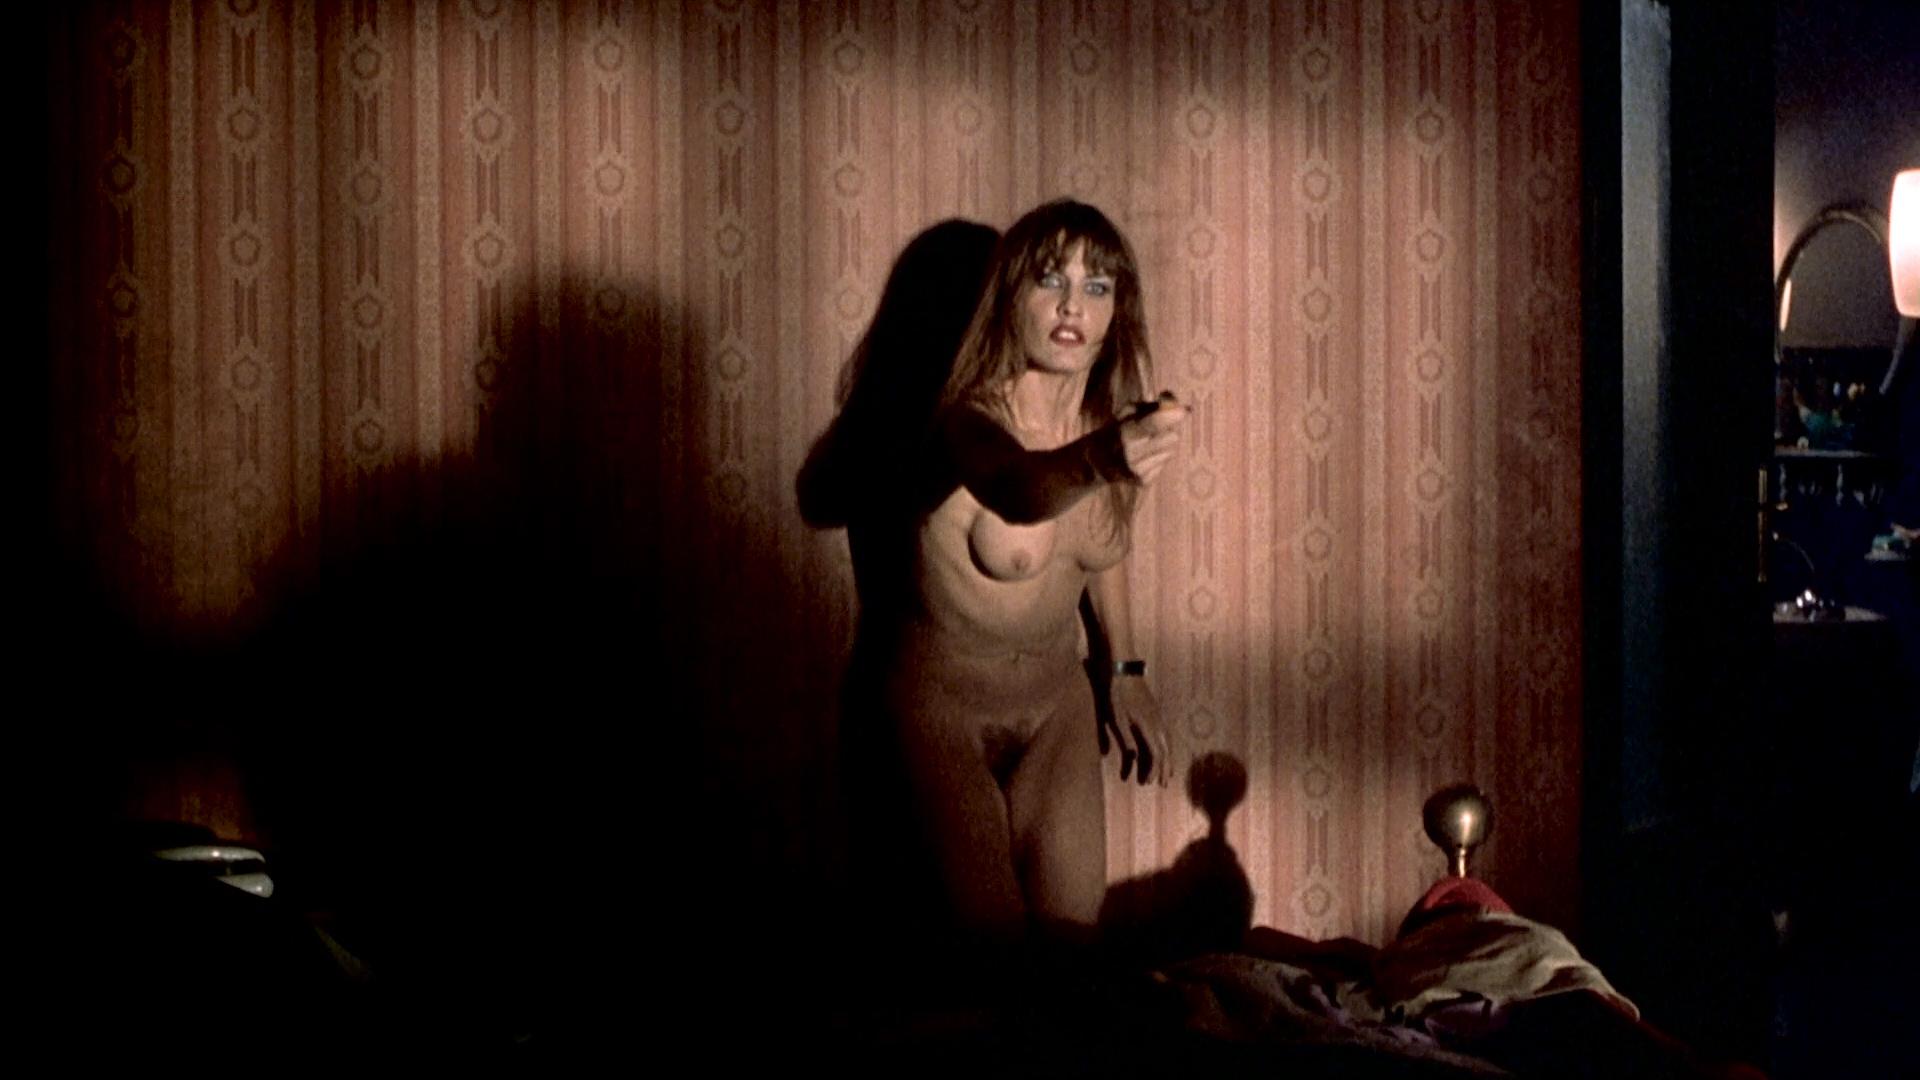 Barbara Lerici nude full frontal and Chiara Caselli nude briefly - Sleepless (IT-2001) HD 1080p (6)